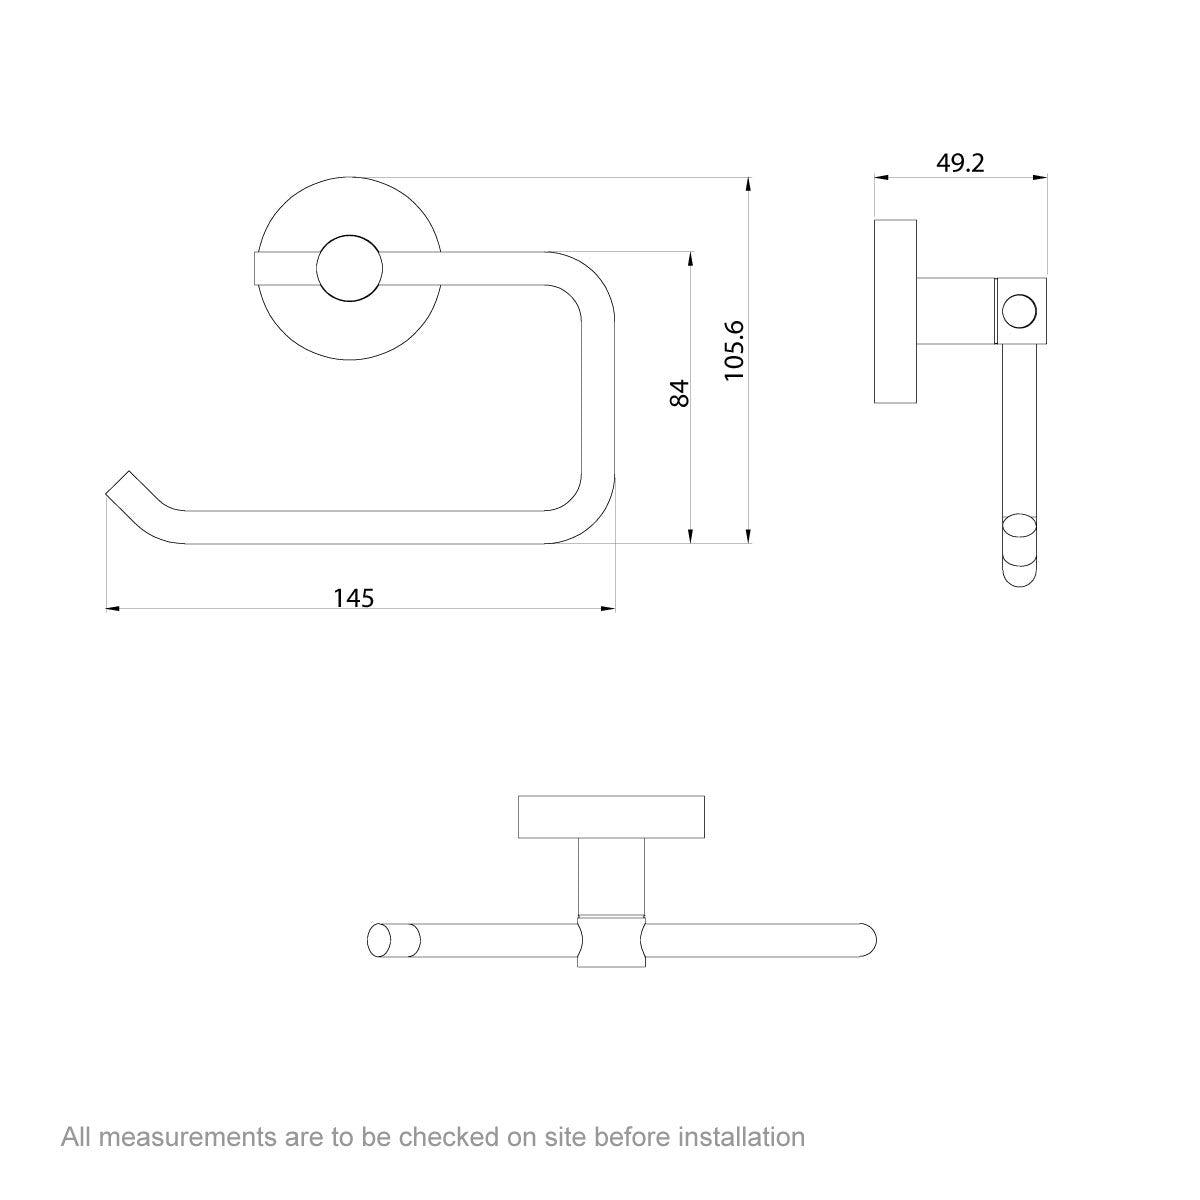 Dimensions for Lunar toilet roll holder